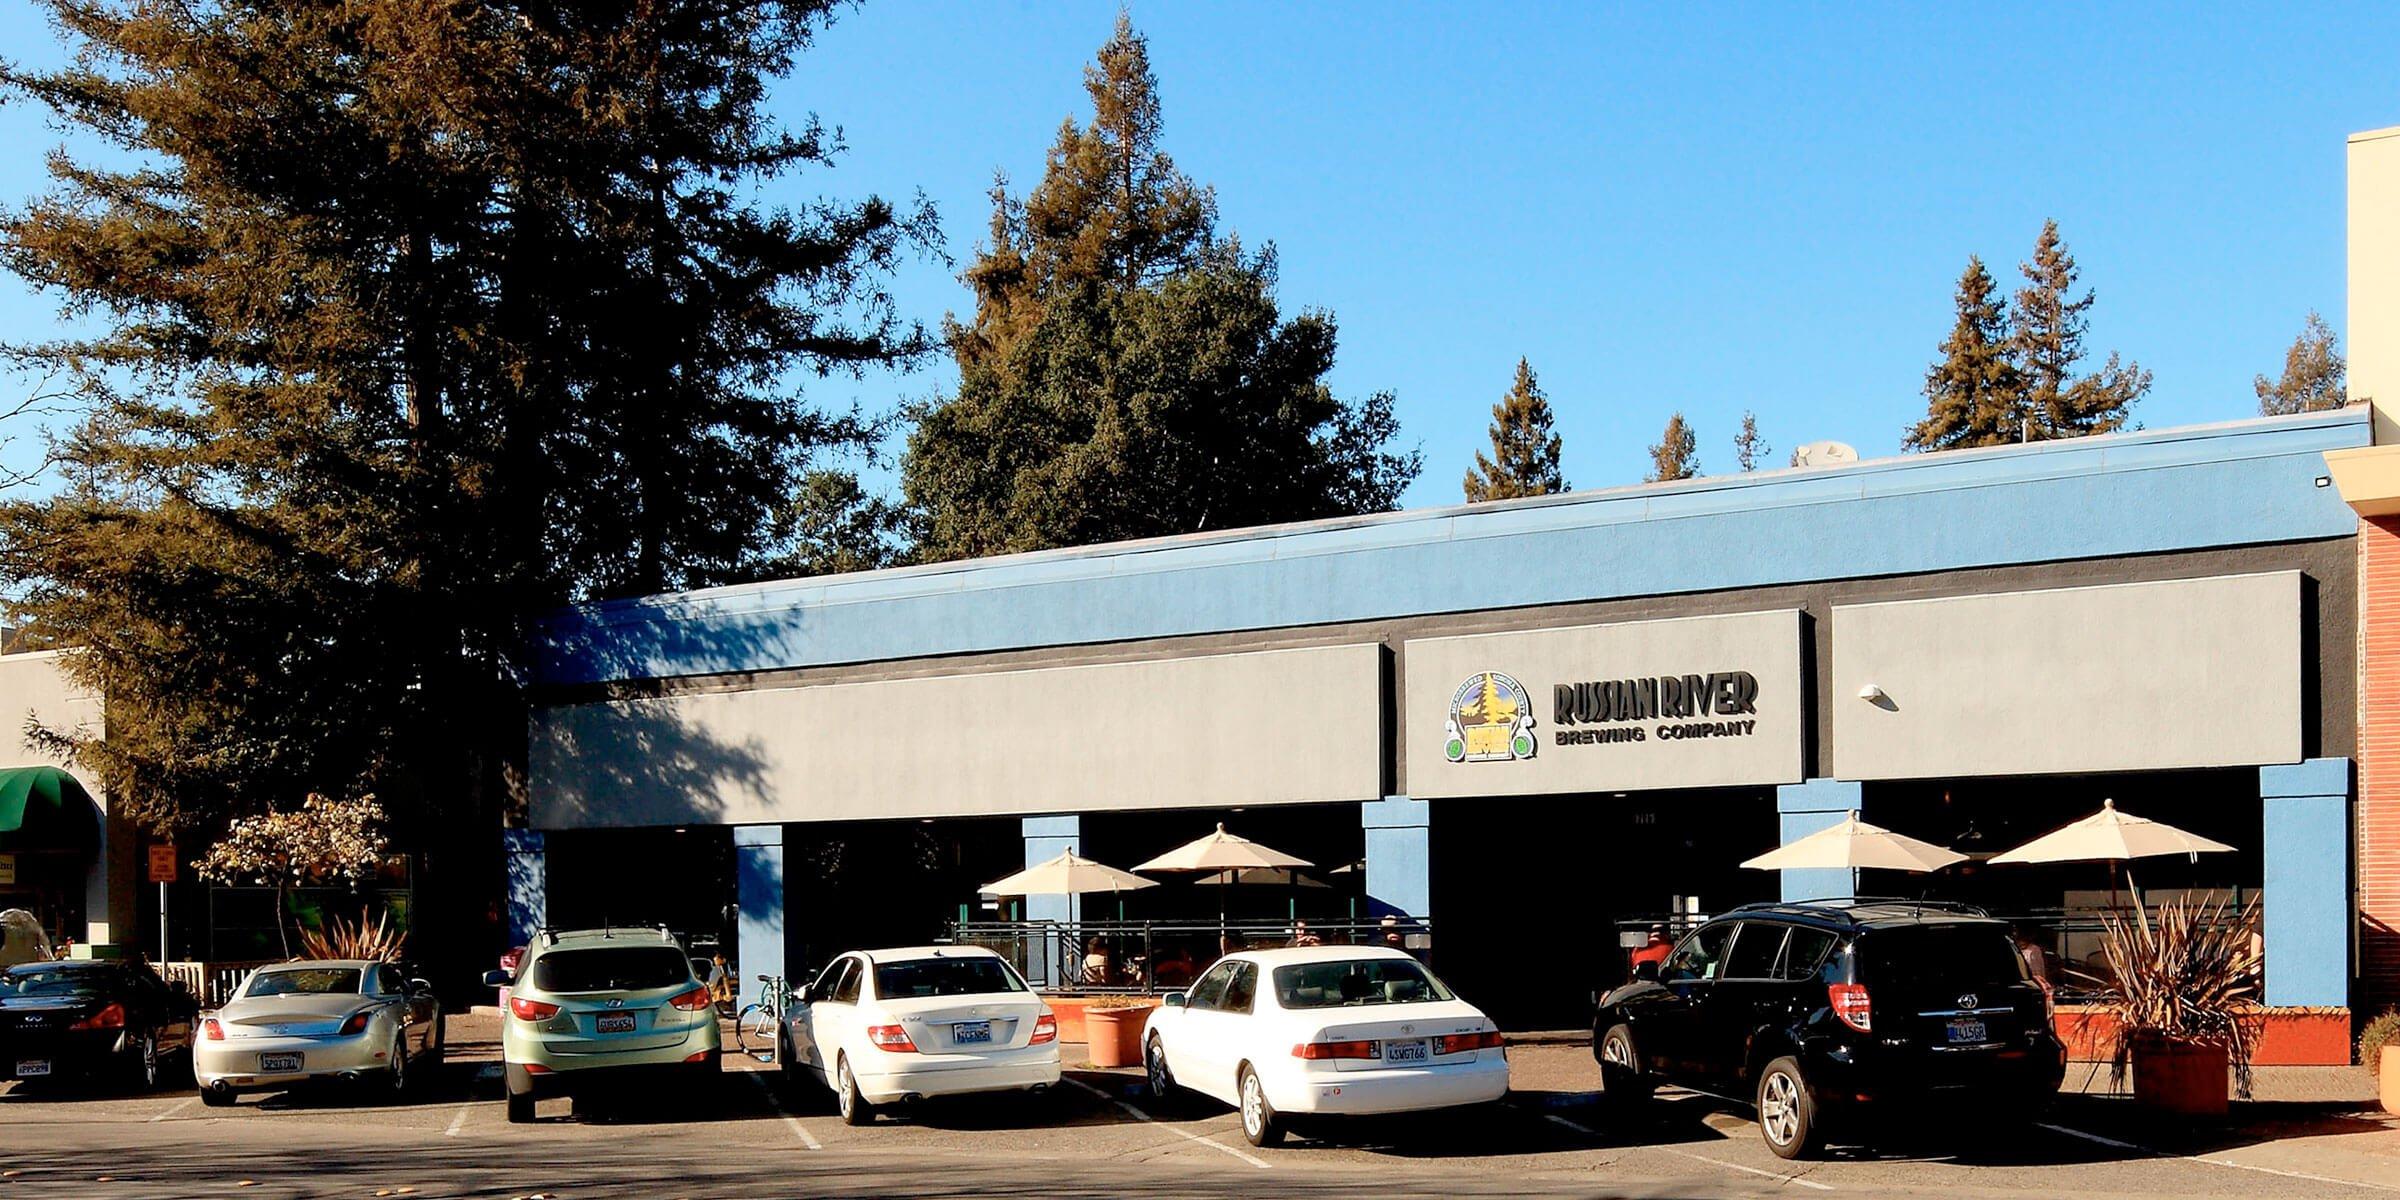 Outside the Russian River Brewing Company taproom in Santa Rosa, California